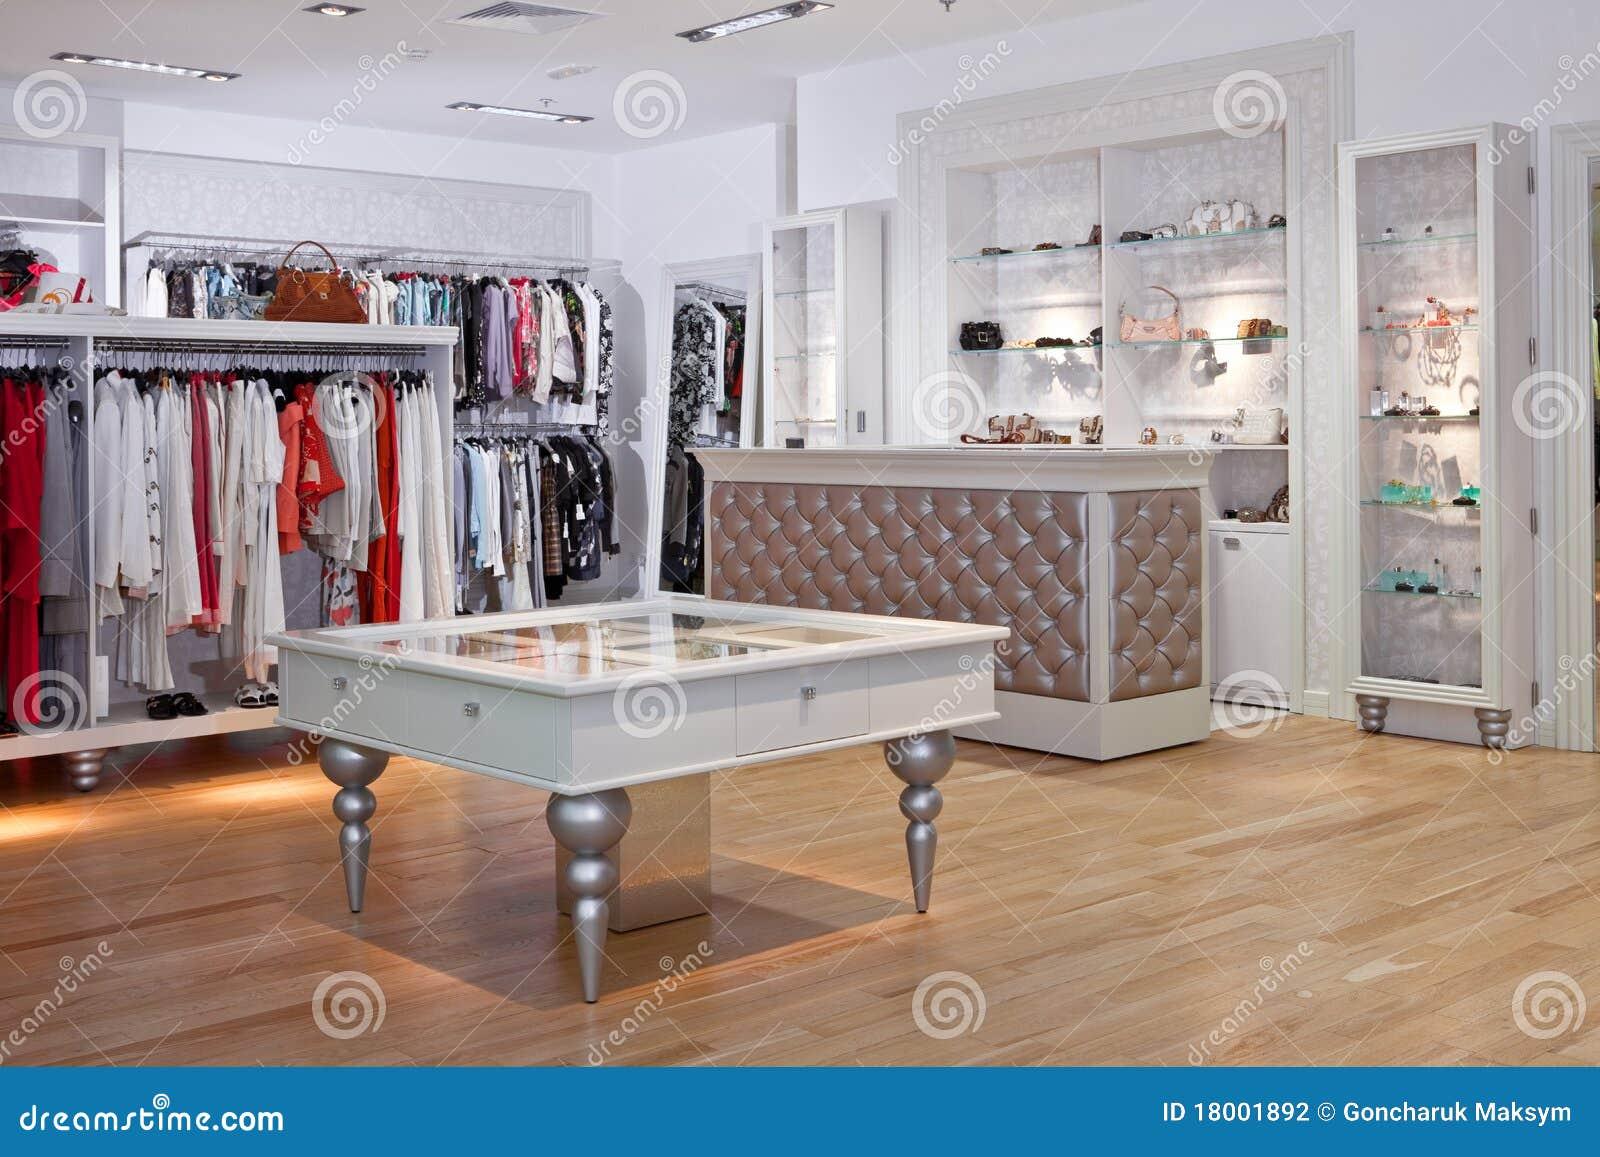 Clothing Store Interior Stock Photo Image Of Shopping